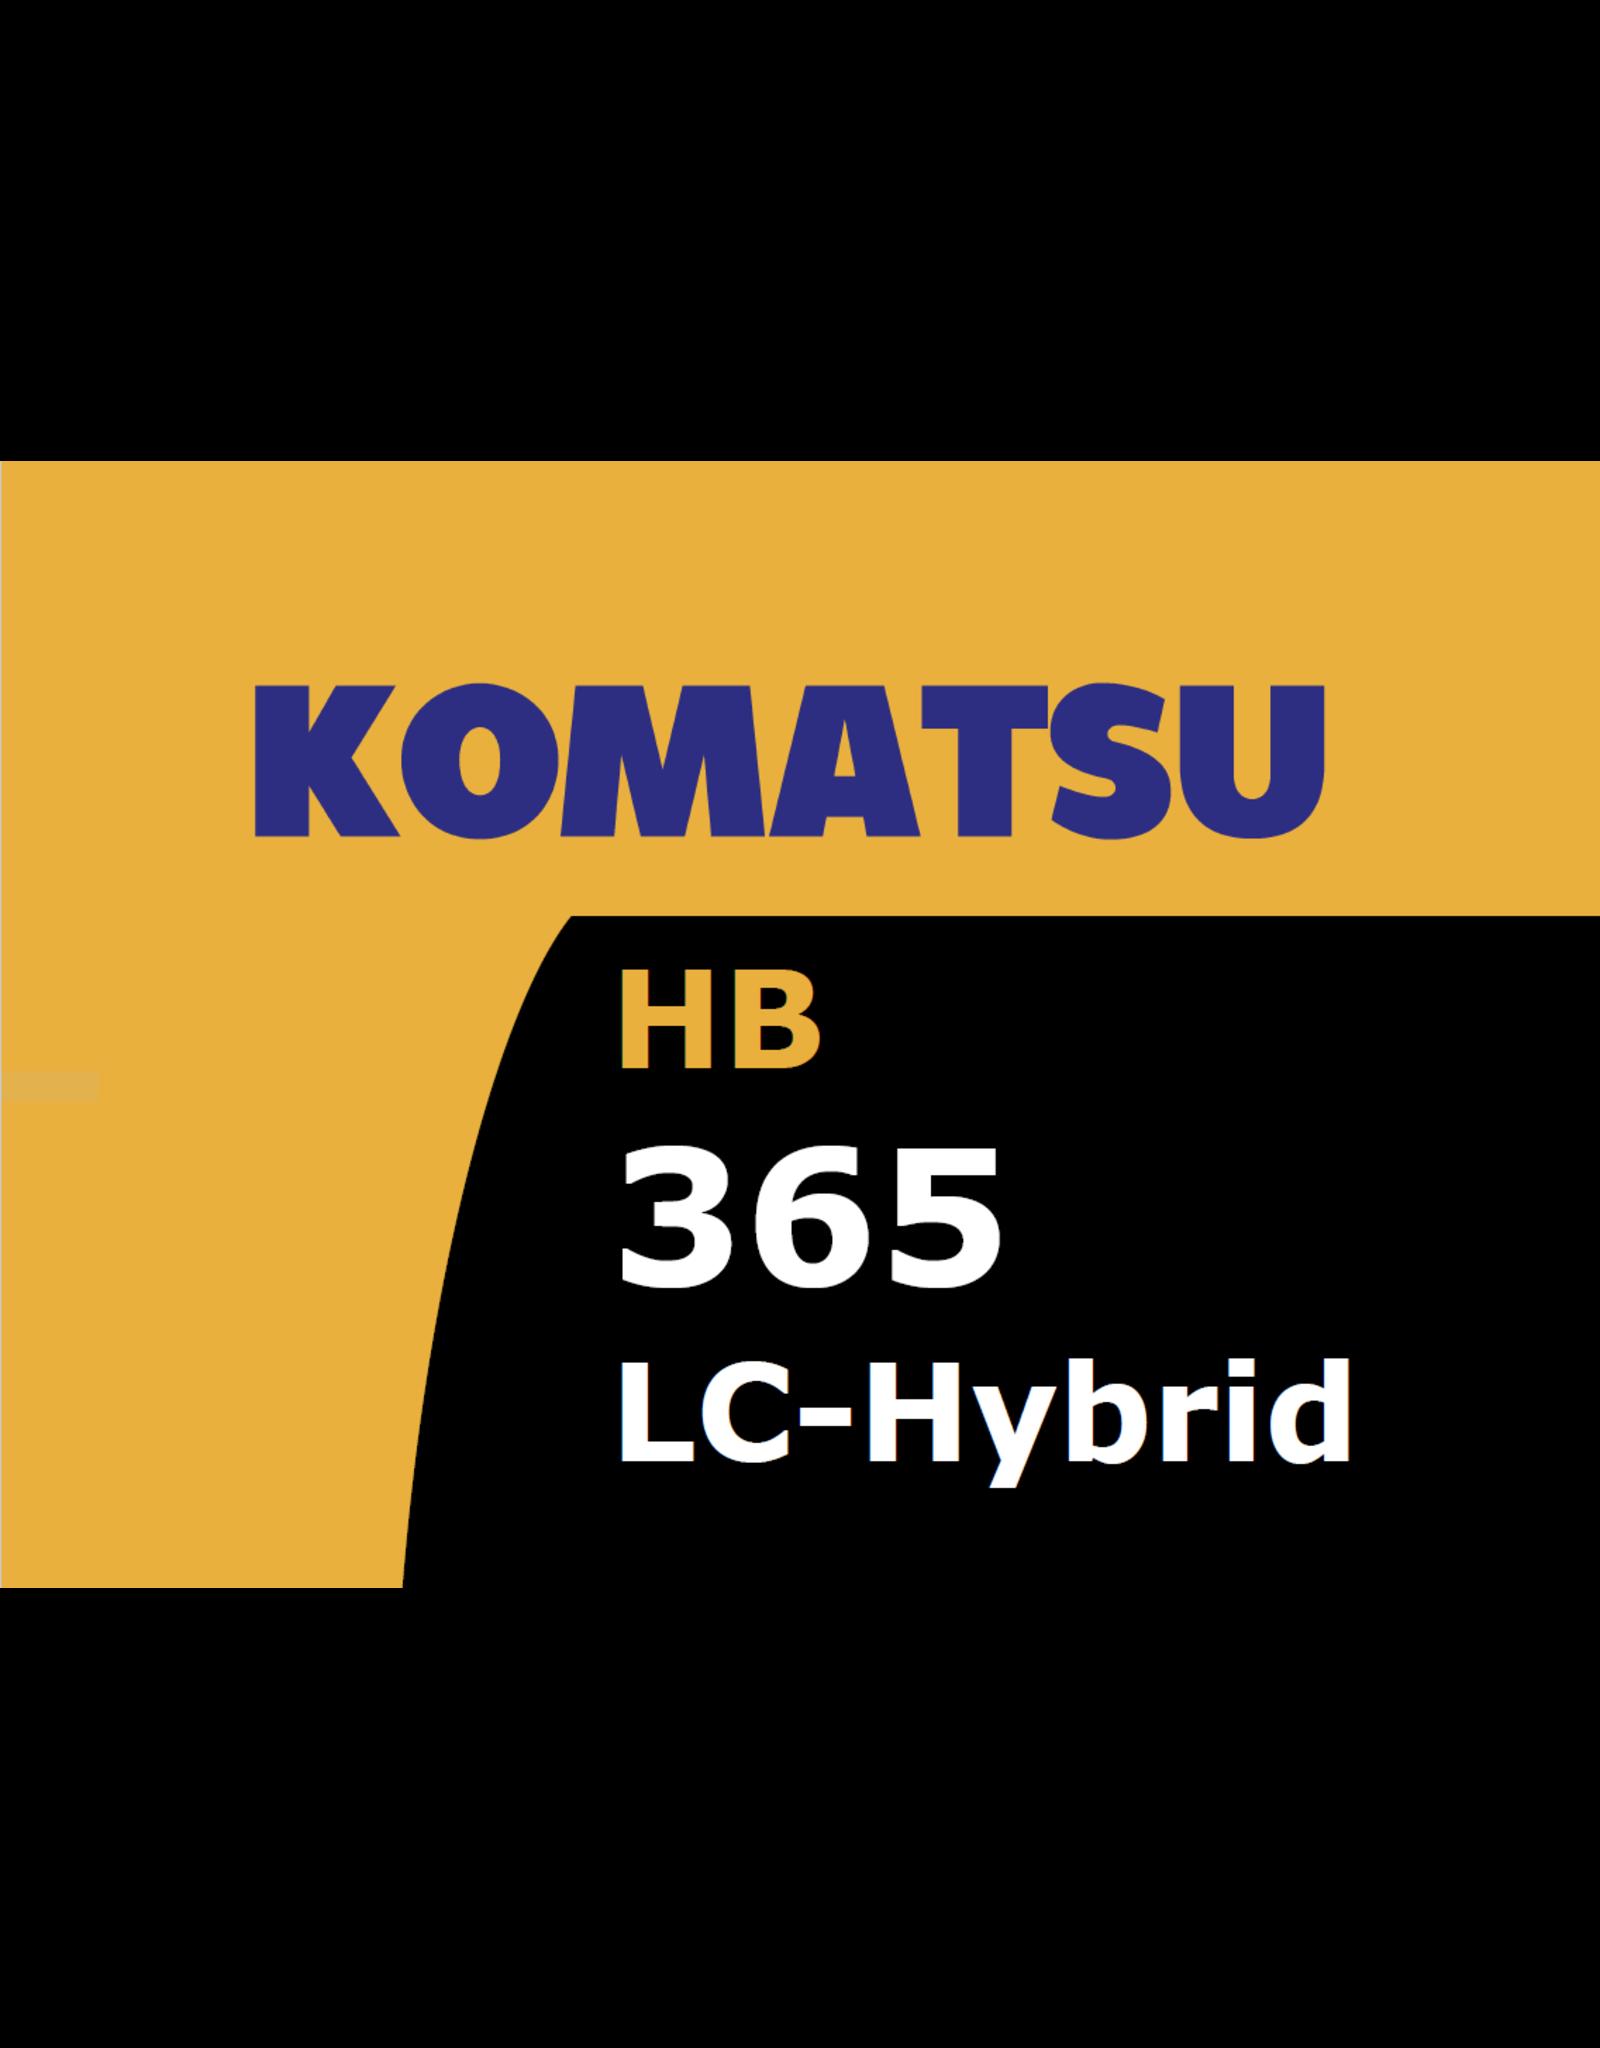 Echle Hartstahl GmbH FOPS for Komatsu HB365LC-3 Hybrid